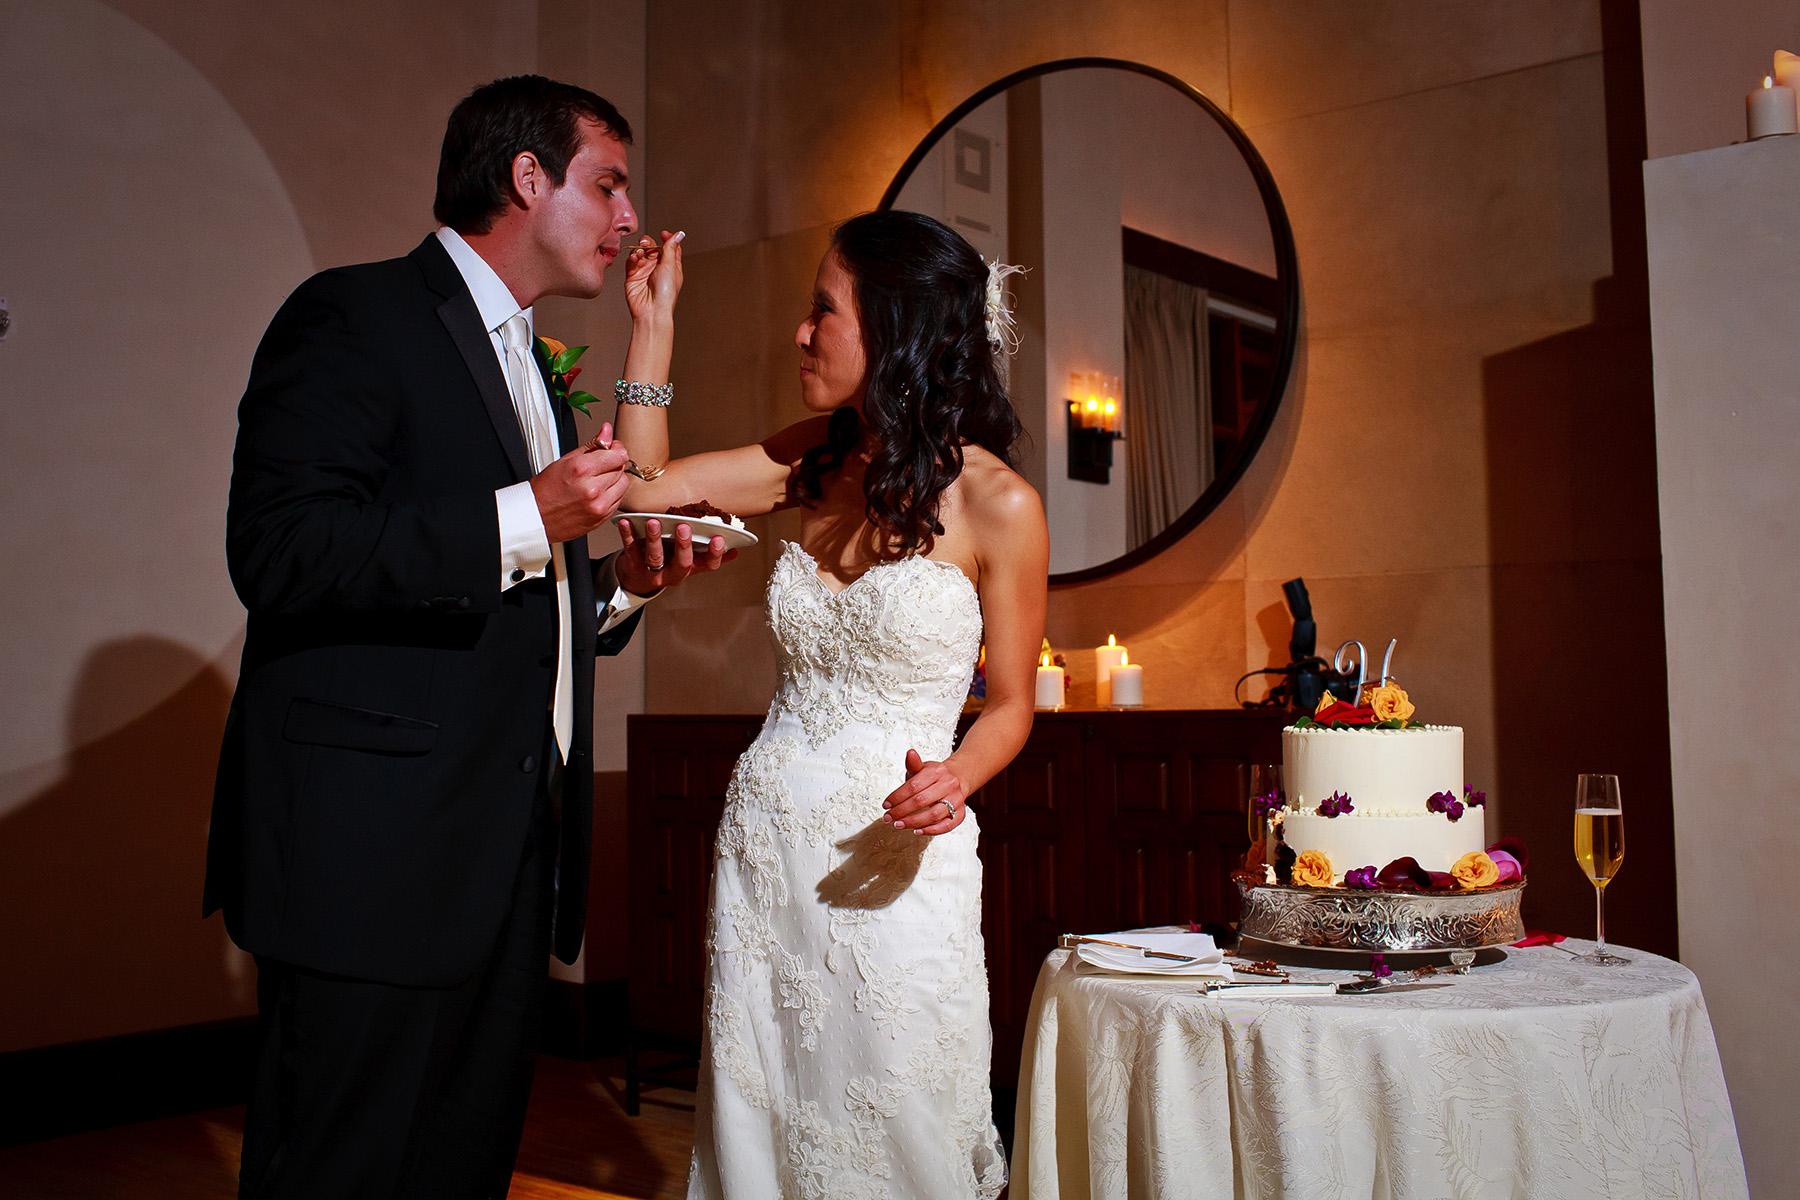 Tabitha-Dallas-wedding-four-seasons-resort-rancho-encantado-santa-fe-new-mexico-1073